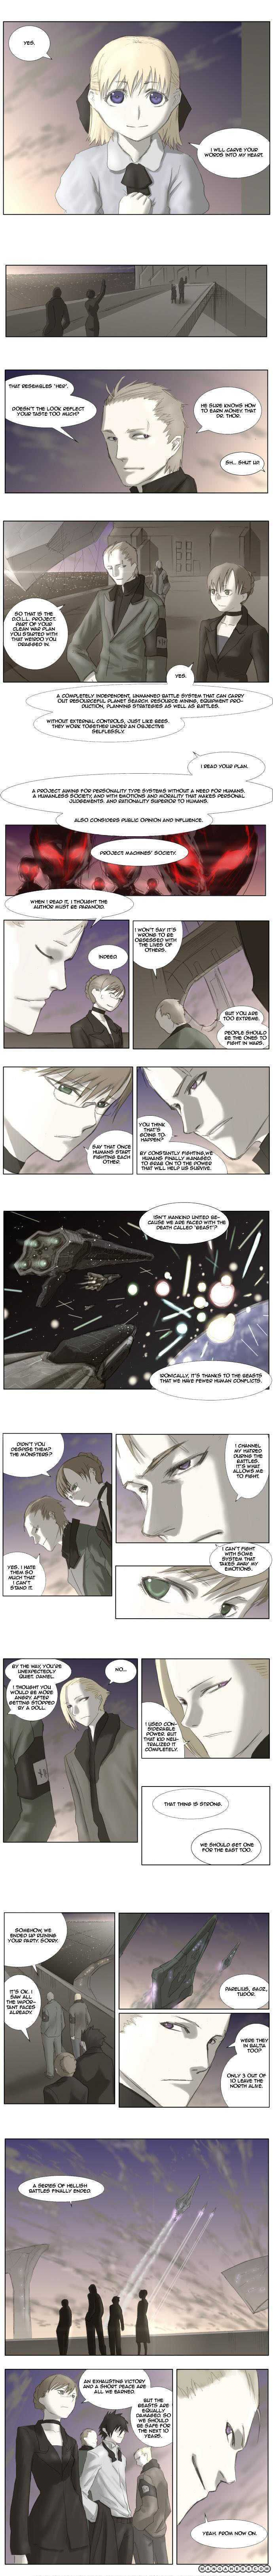 Knight Run 9 Page 4